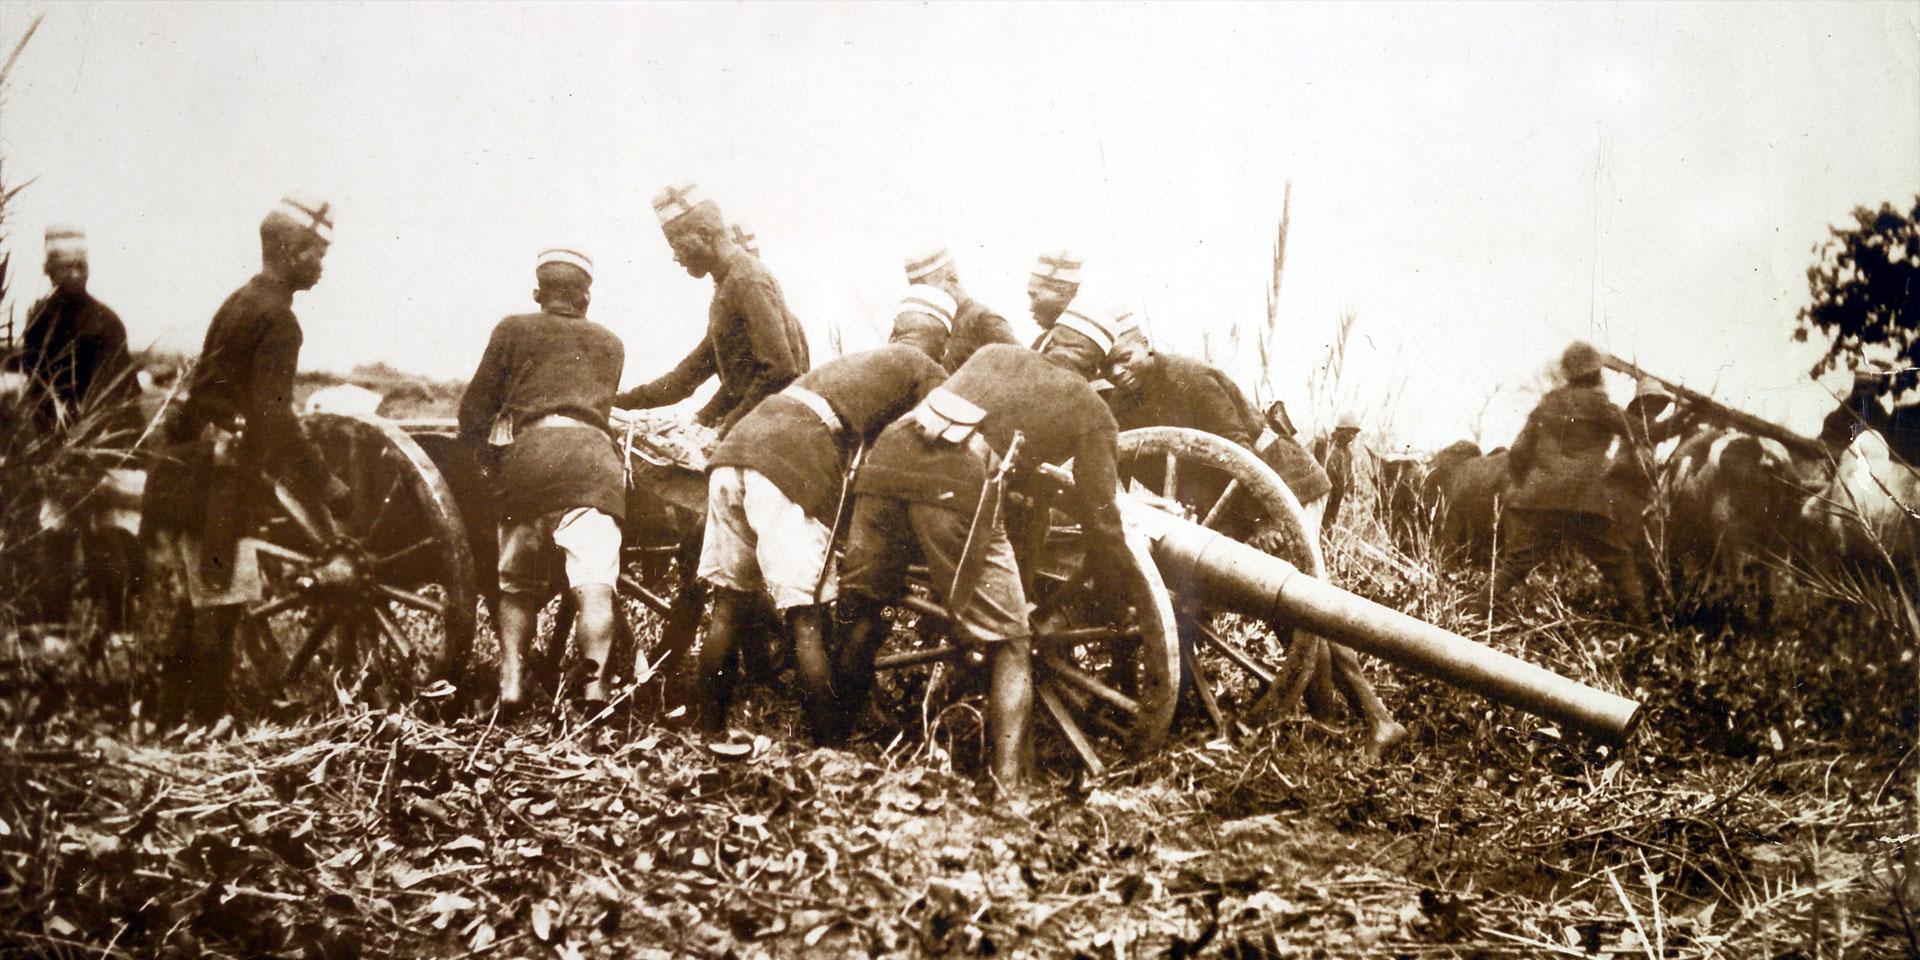 Askaris moving a field gun into position, c1914